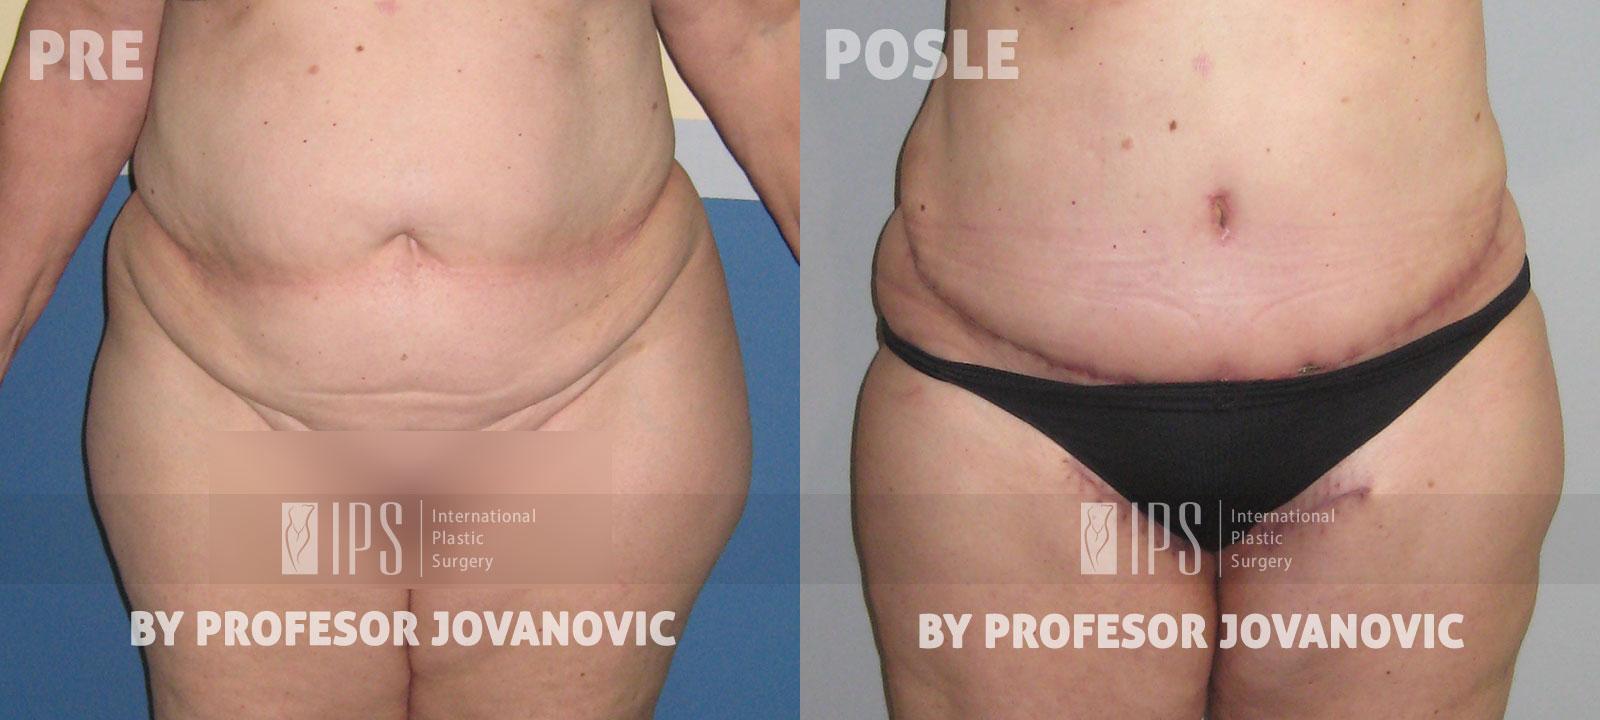 Liposukcija - pre i posle, napred